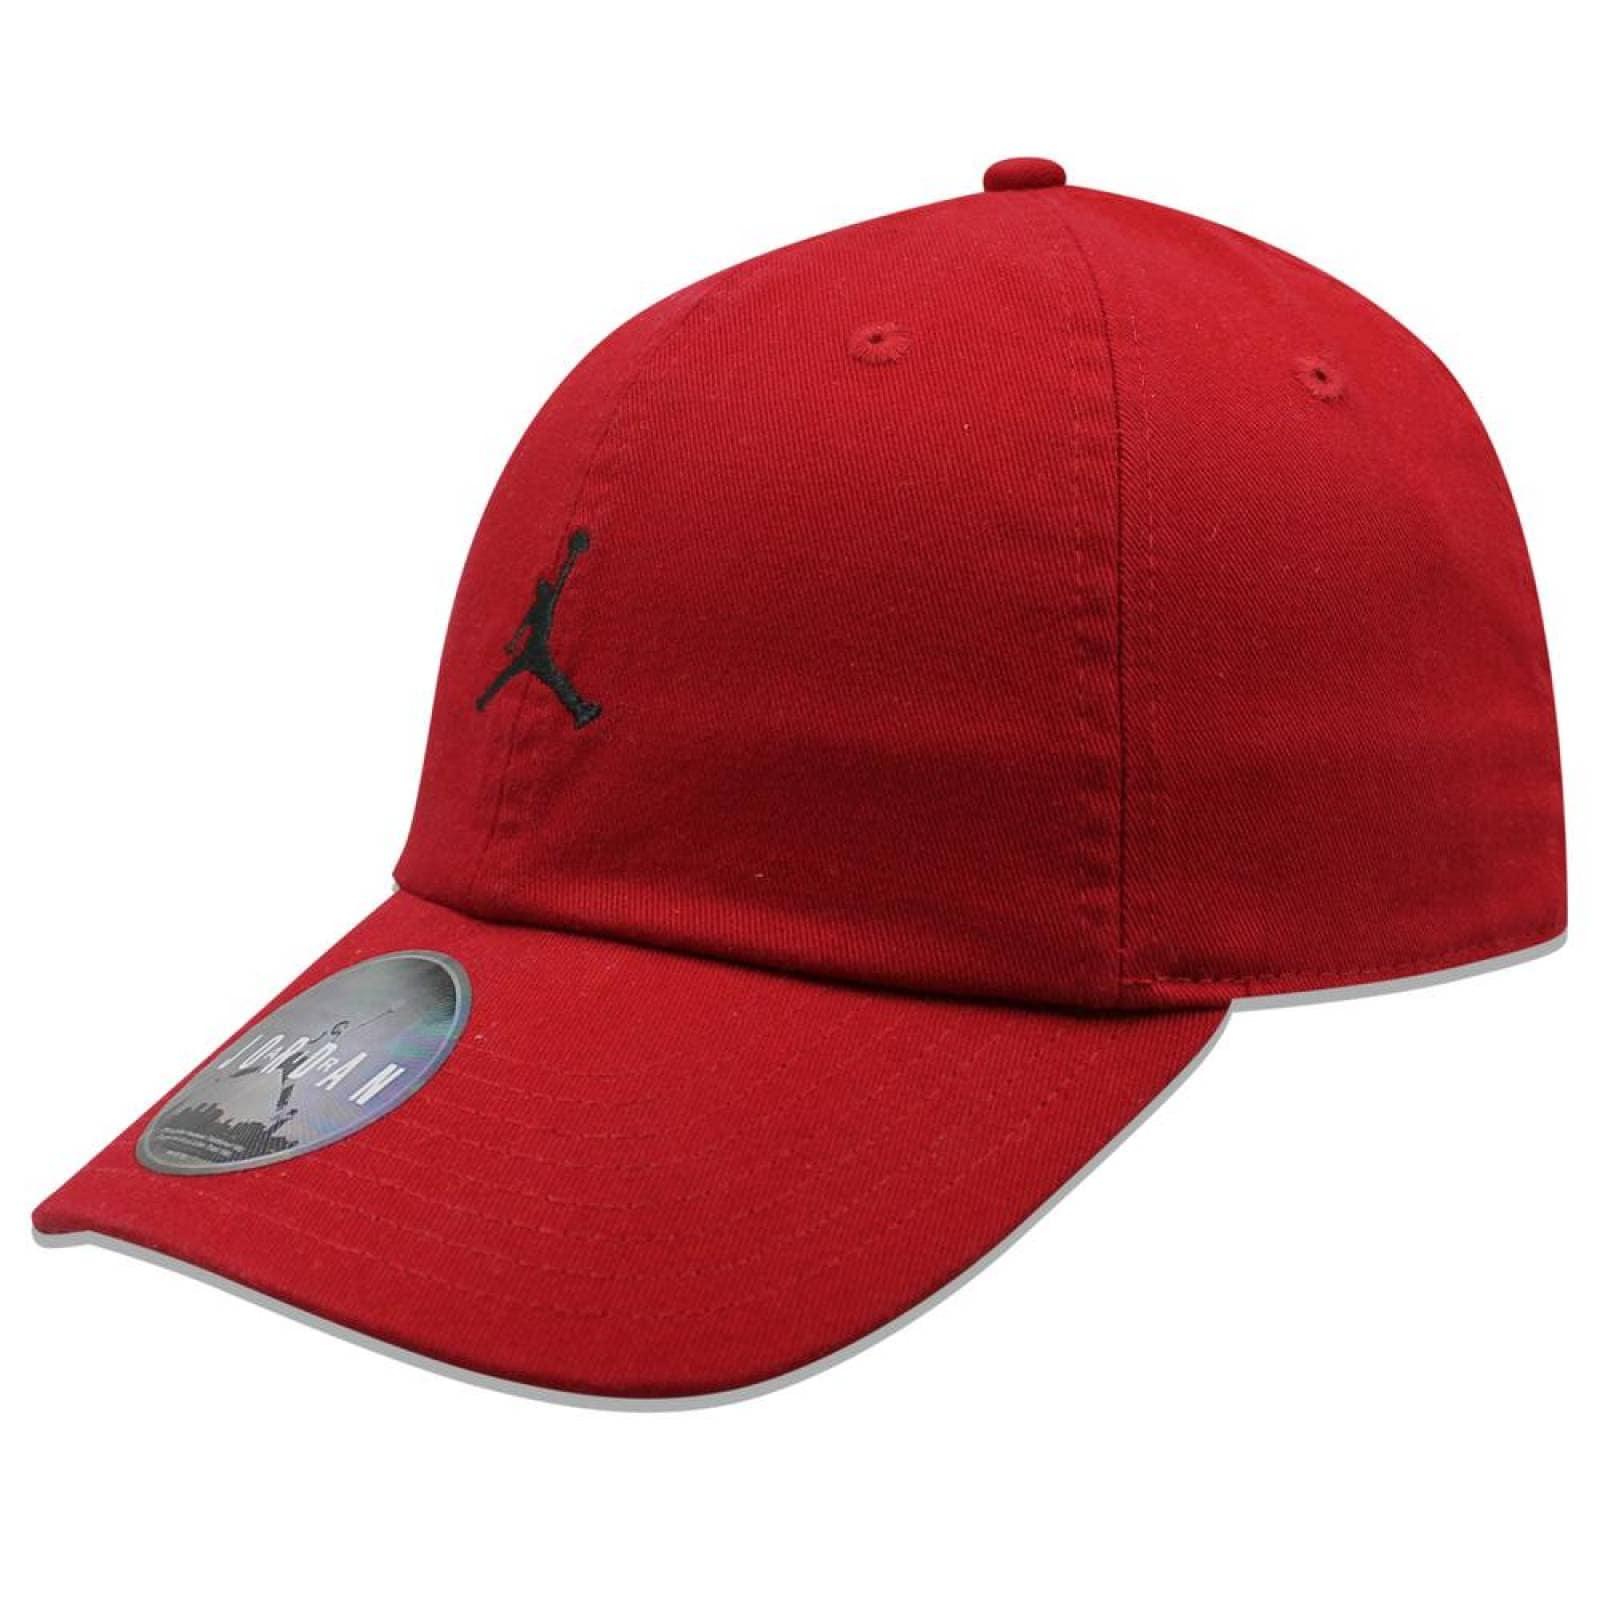 Gorra Nike Jordan Jumpman Floppy Rojo